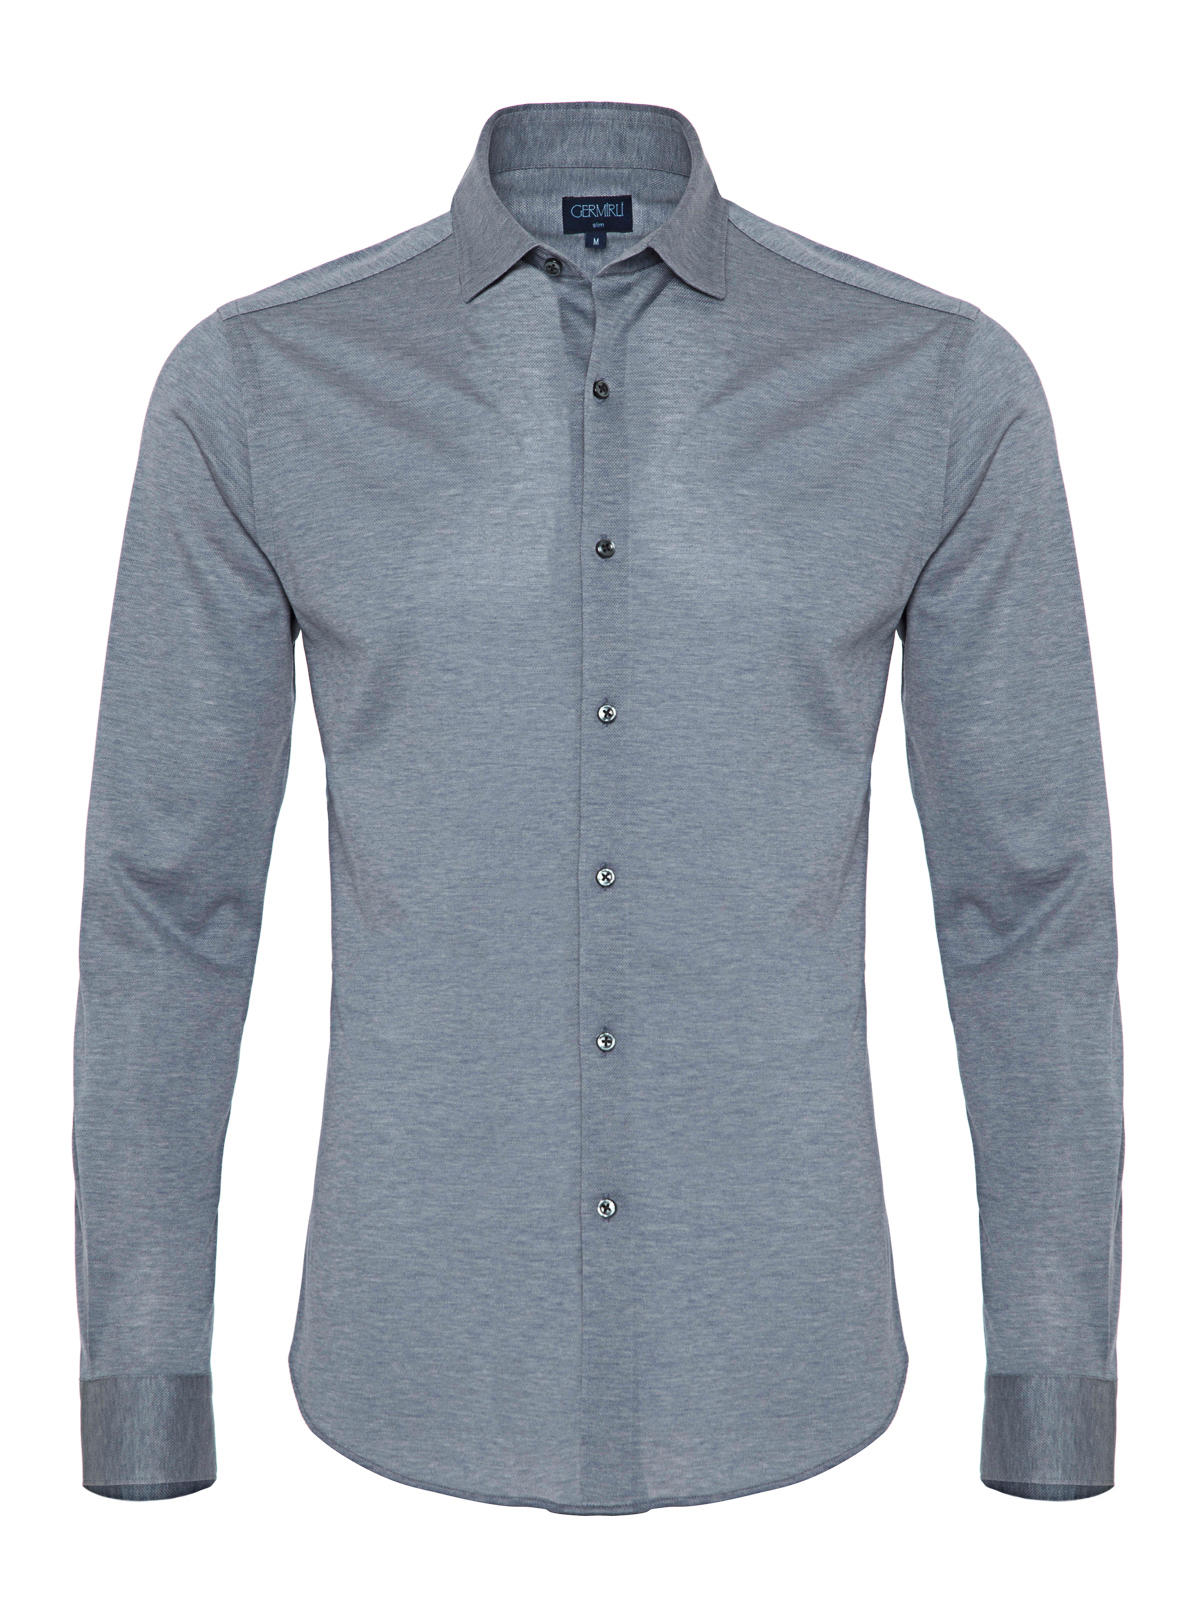 Germirli A.Mavi Klasik Yaka Piquet Örme Slim Fit Gömlek